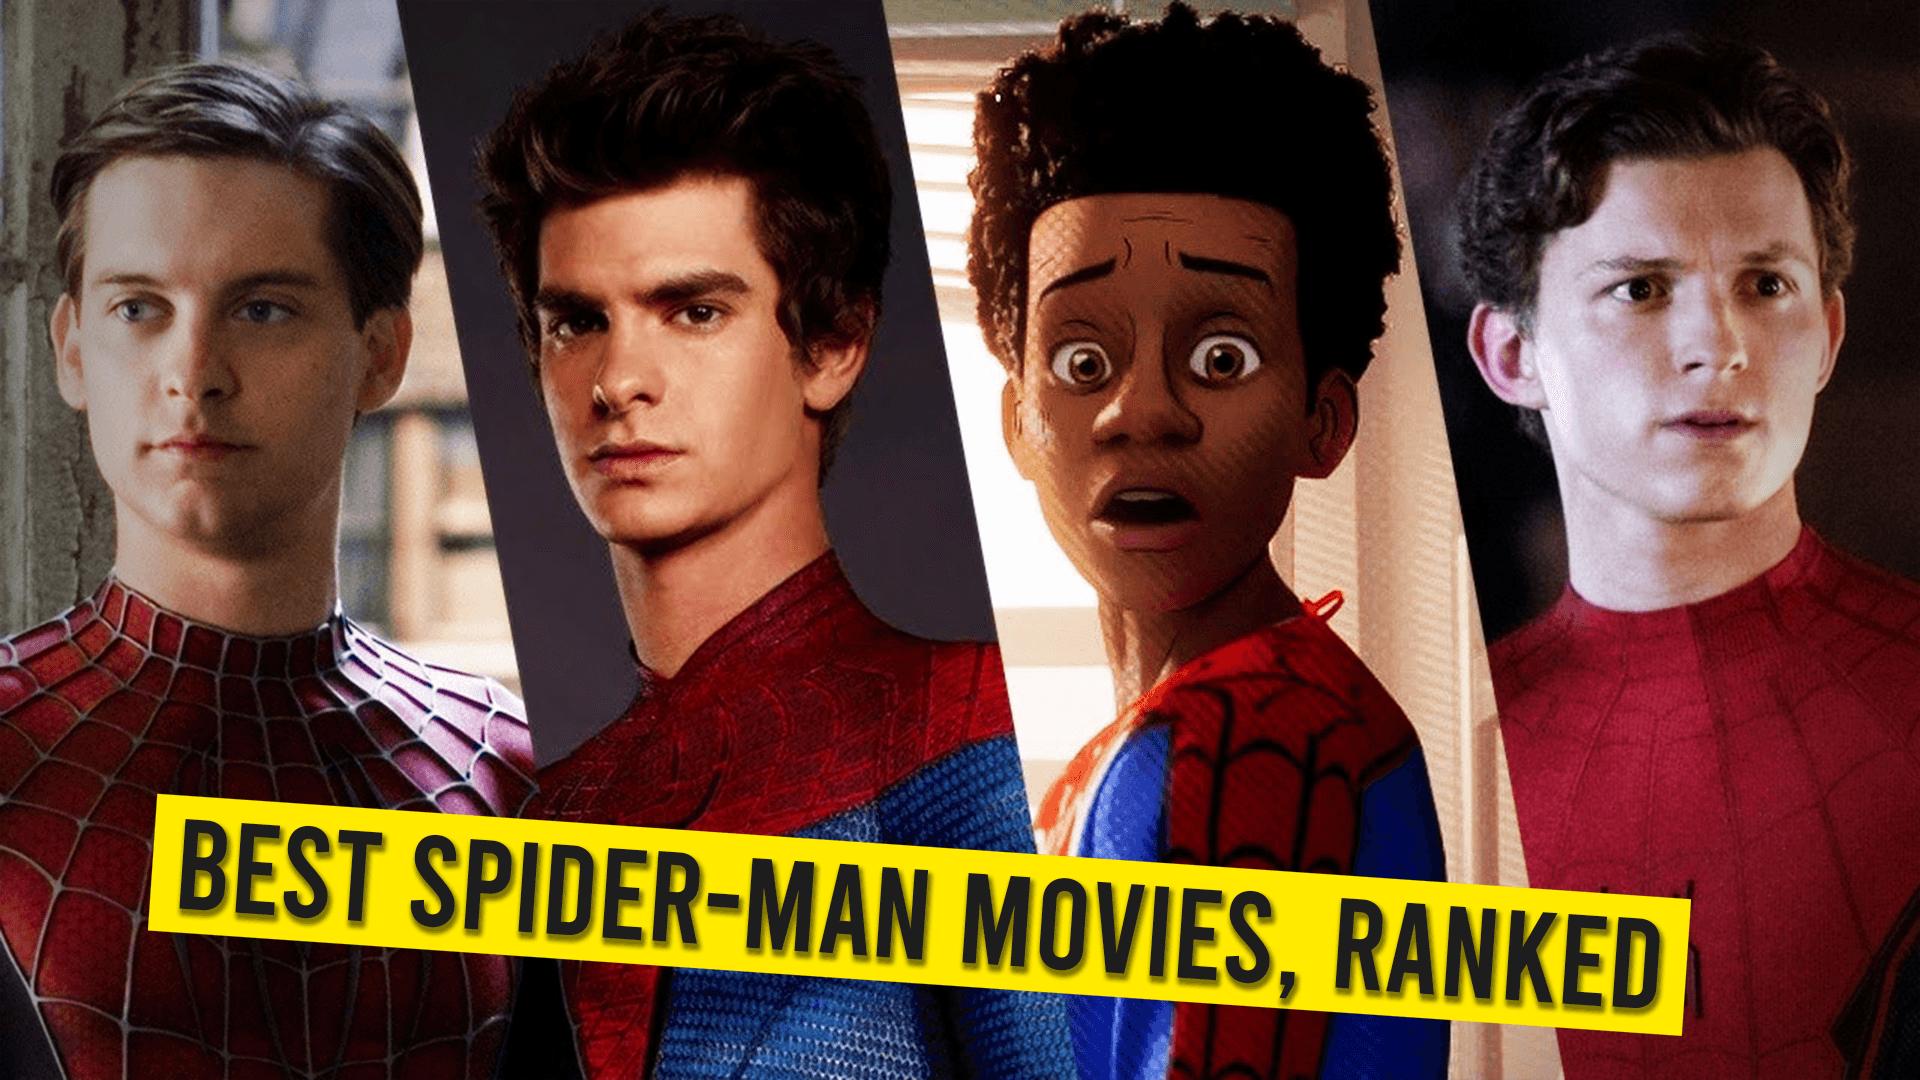 Rankings of Best Spider Man Movies